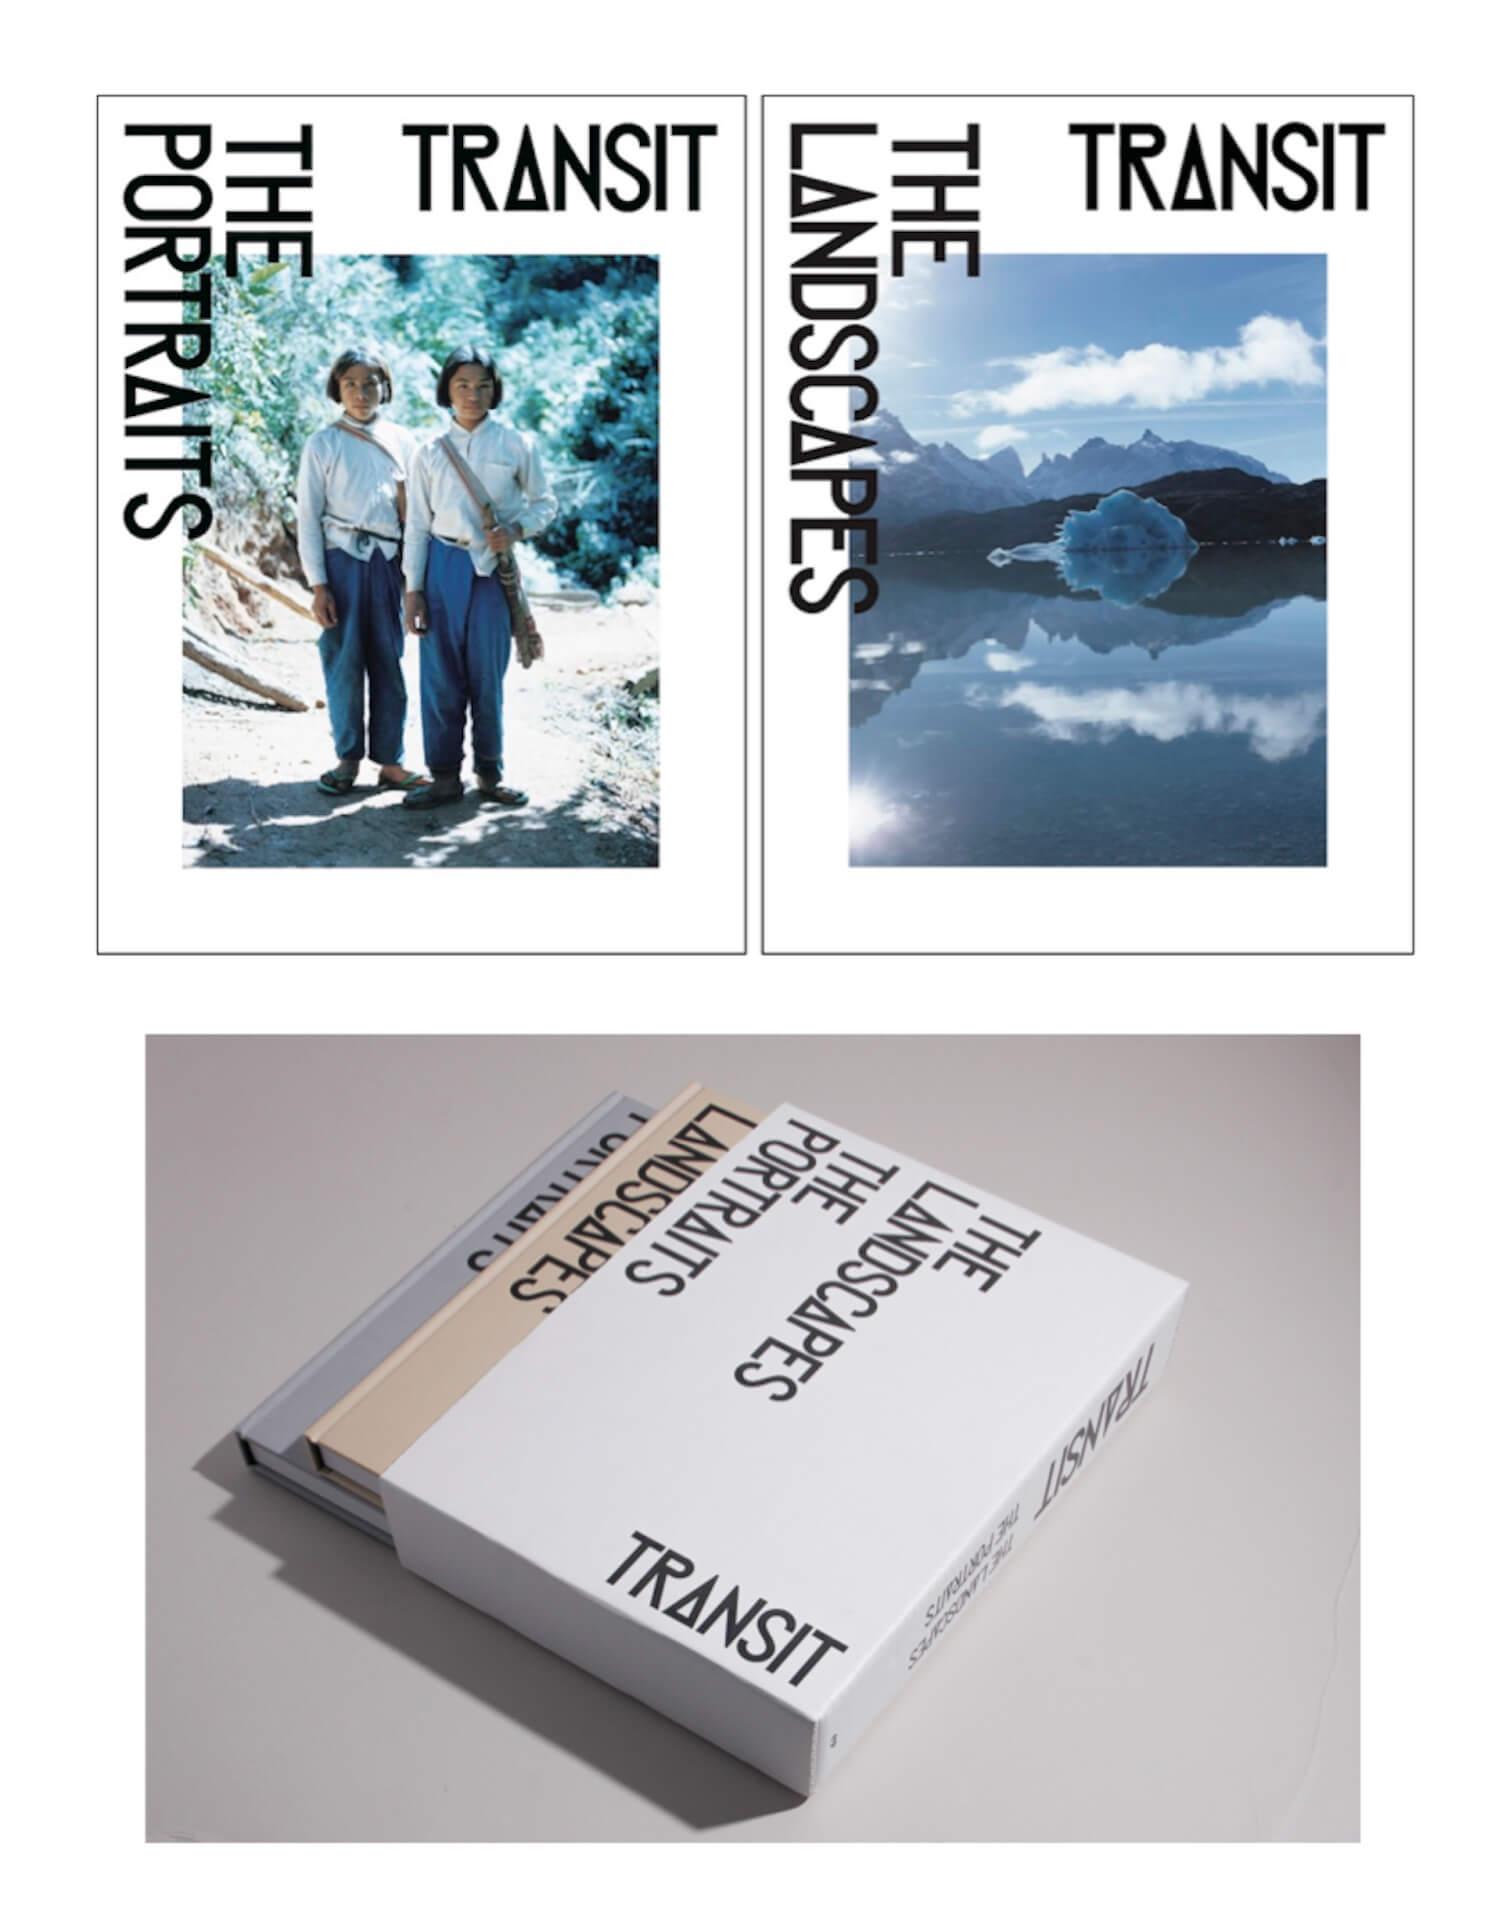 『TRANSIT』の10年超の歩みが2冊の写真集に!企画展<光の記憶- Through our habitat>も開催 art191029_transit_main